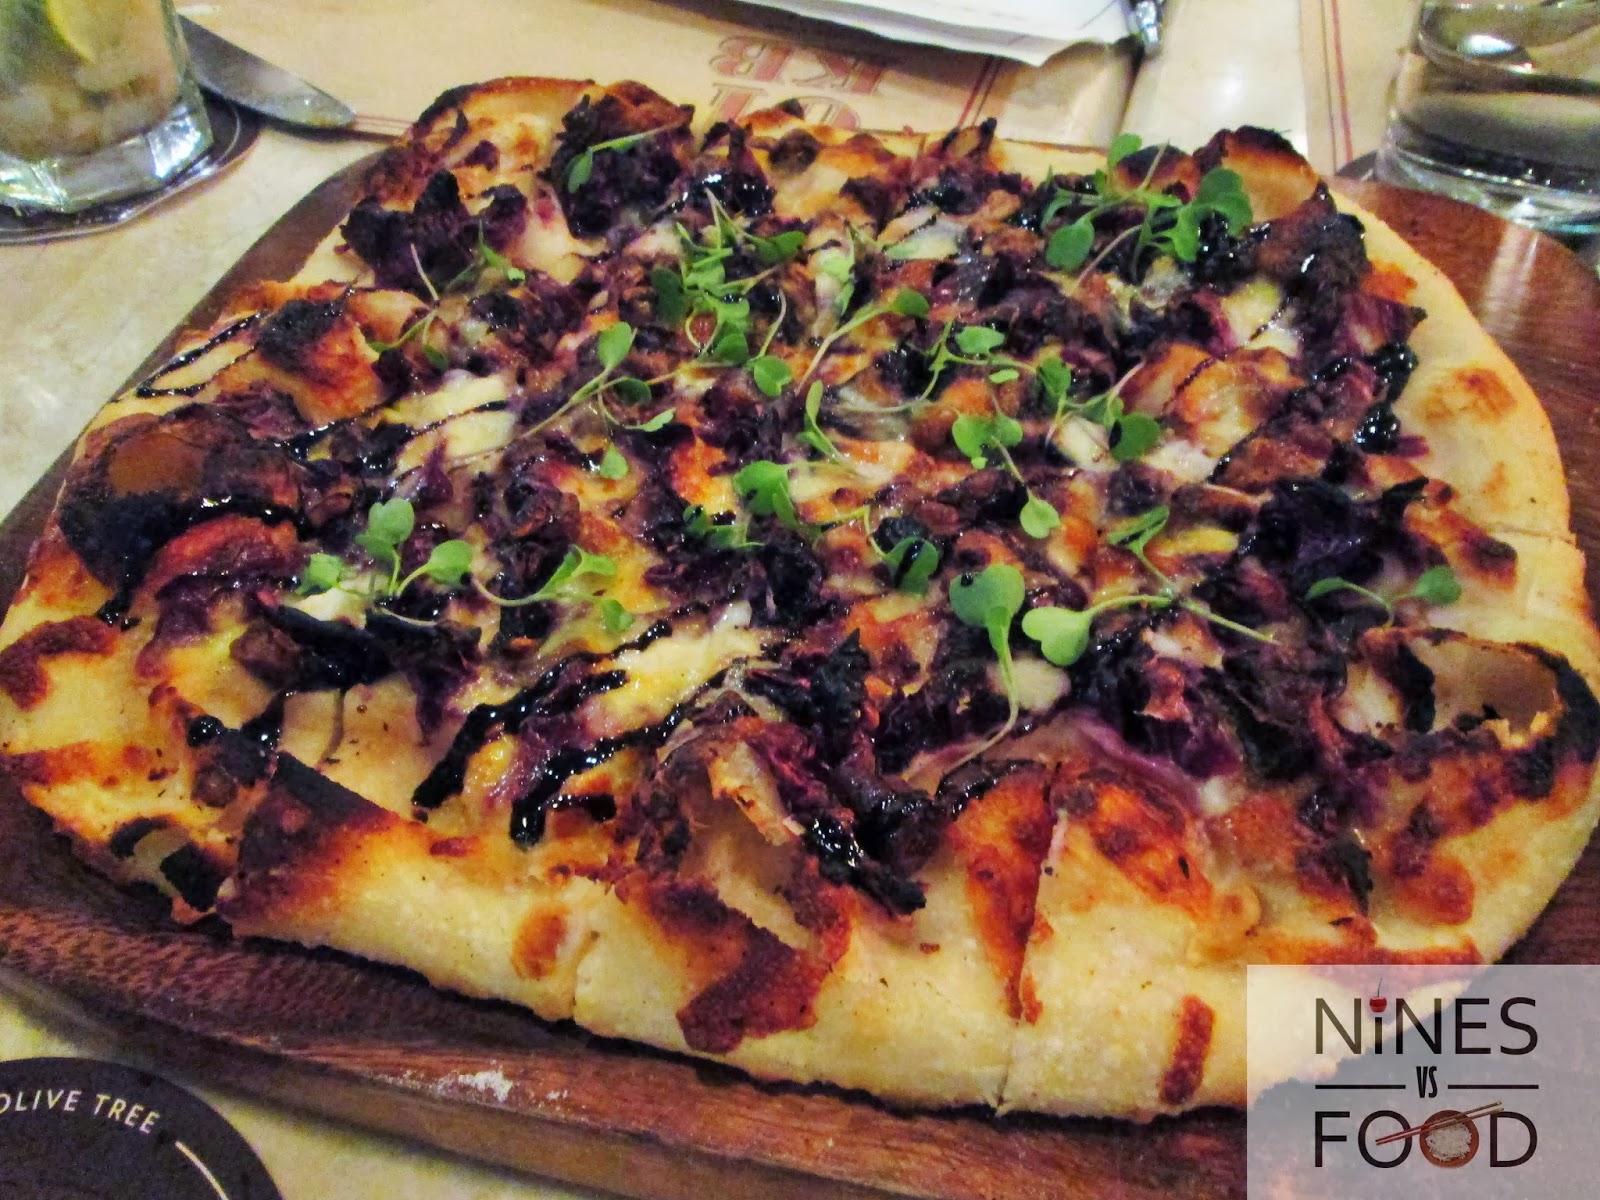 Nines vs. Food - Olive Tree Kitchen and Bar-18.jpg